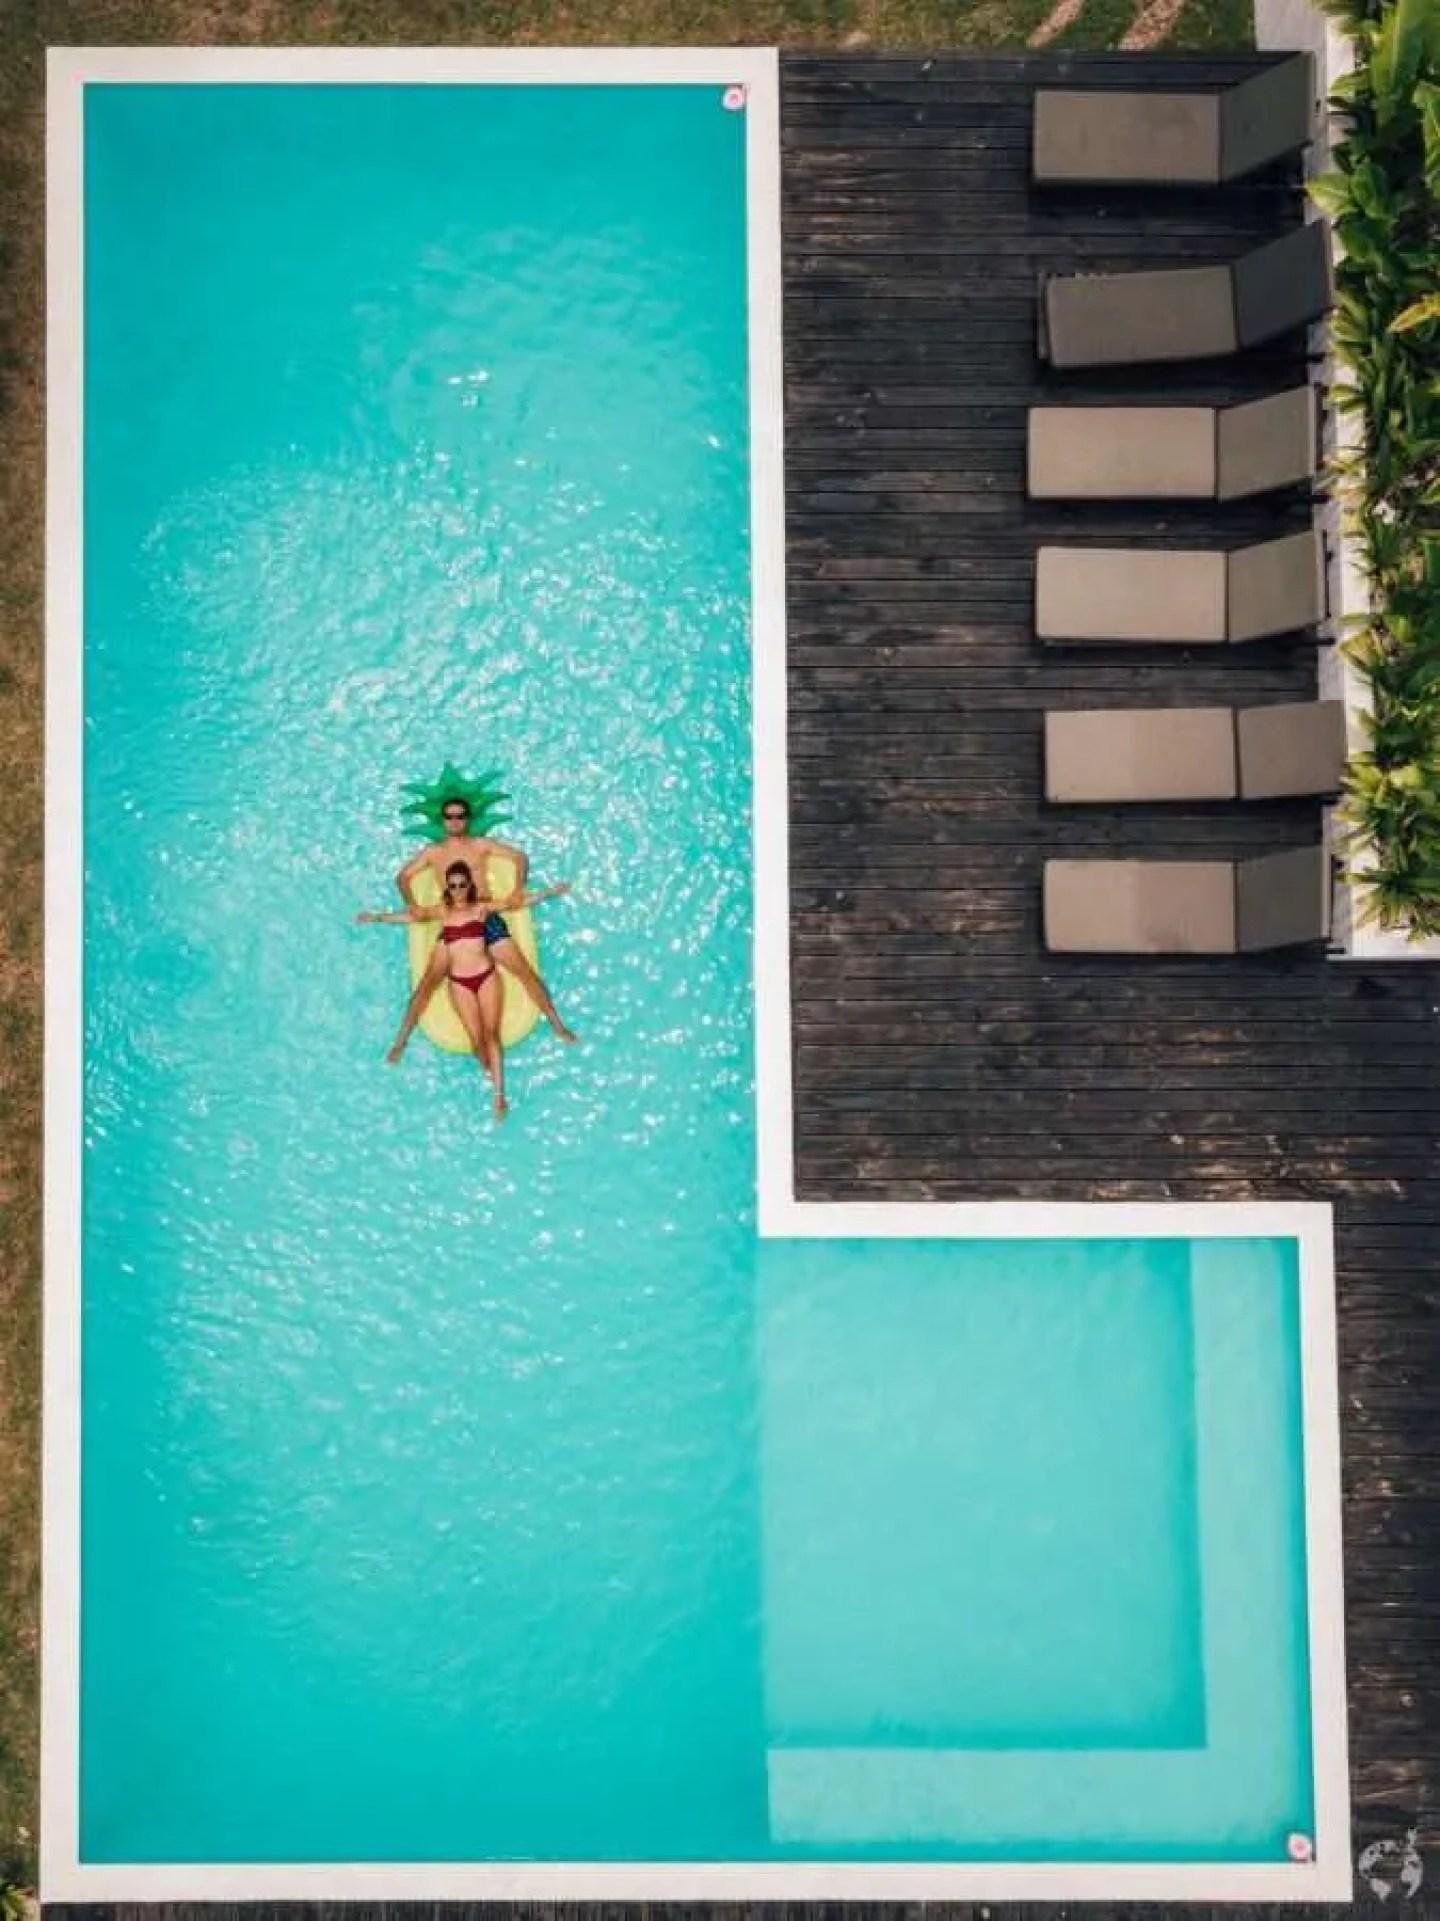 The Moso resort swimming pool